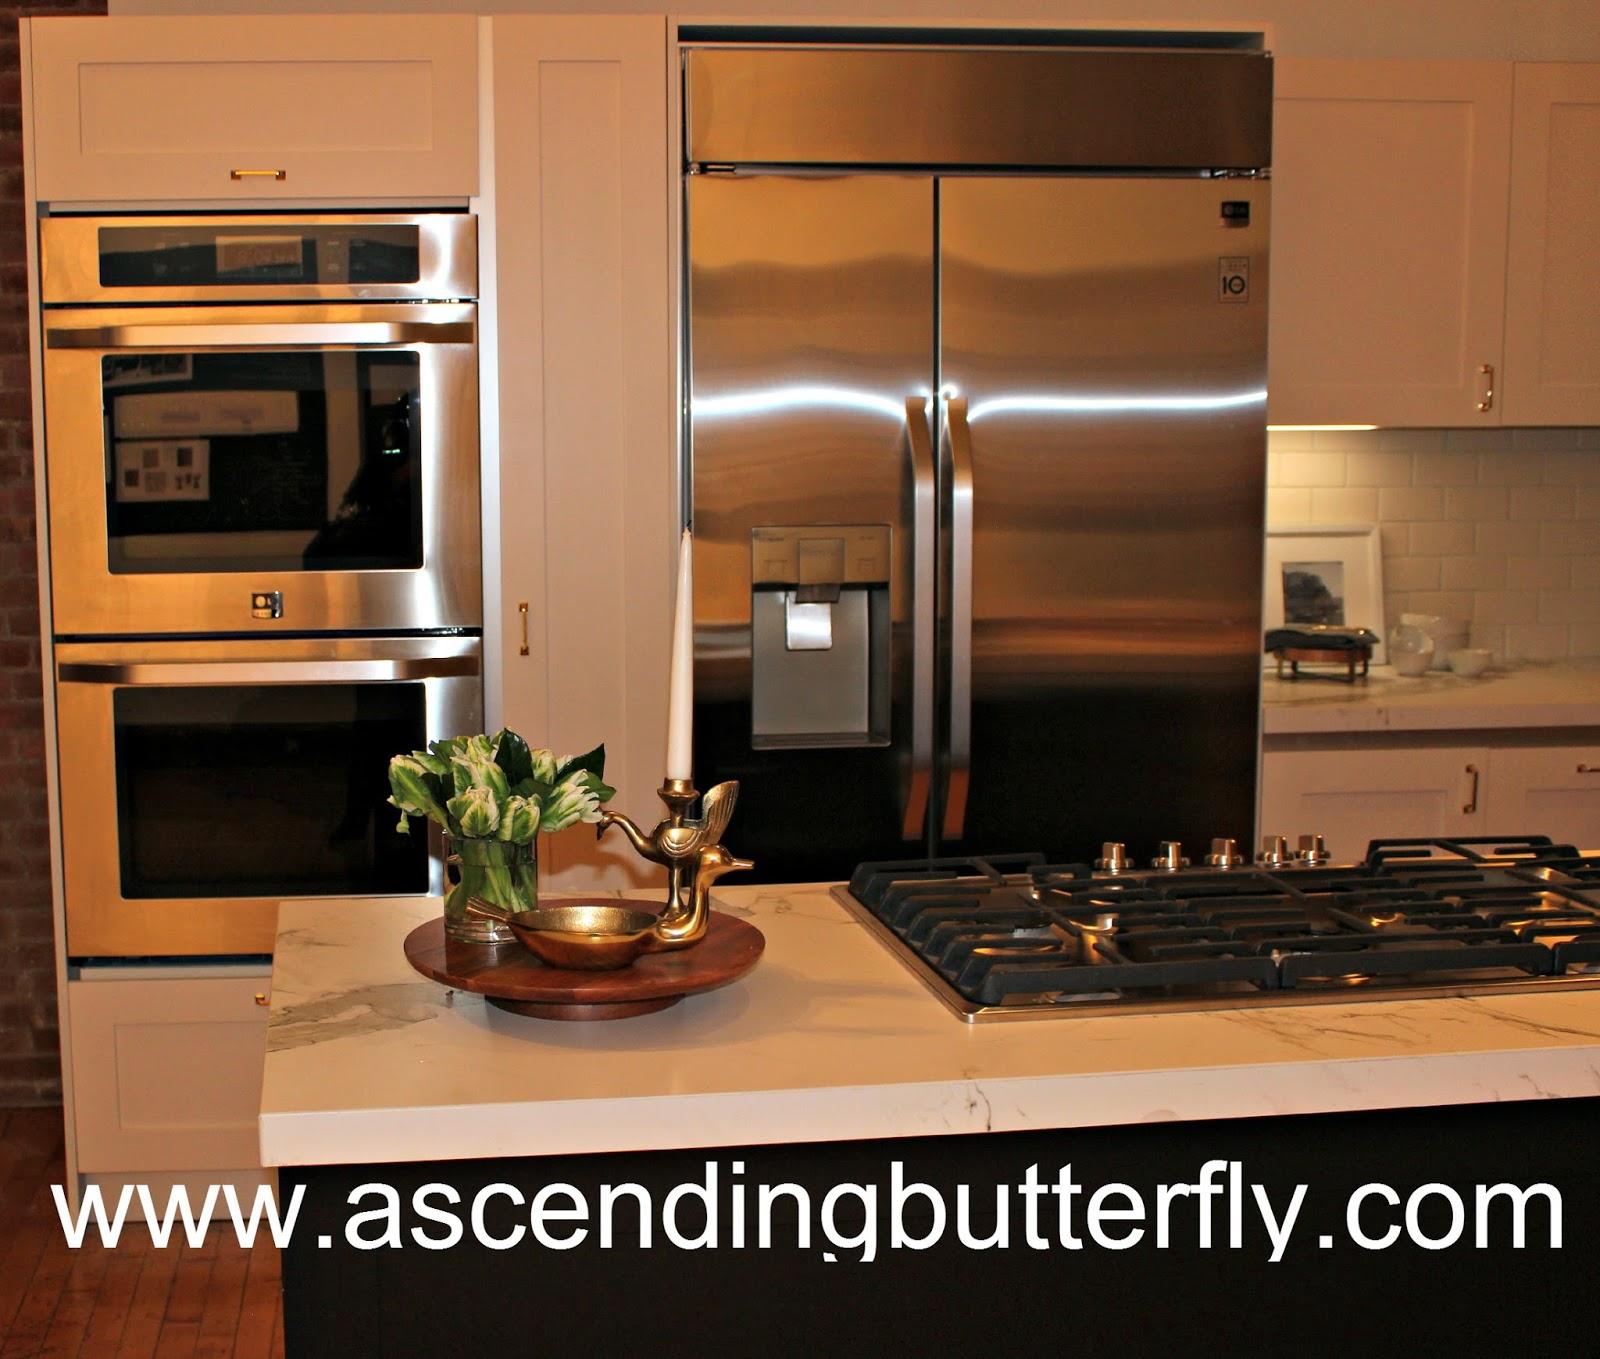 100 kitchen appliances lg dishwasher and revie